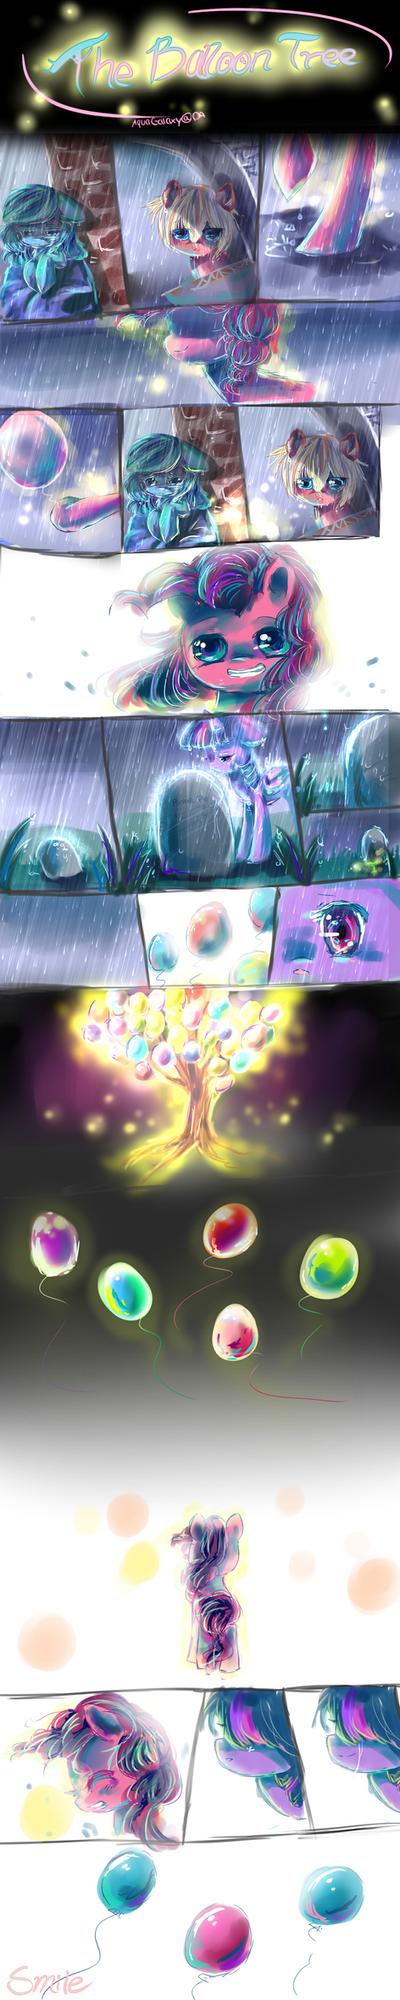 MLP comic The Balloon tree by AquaGalaxy